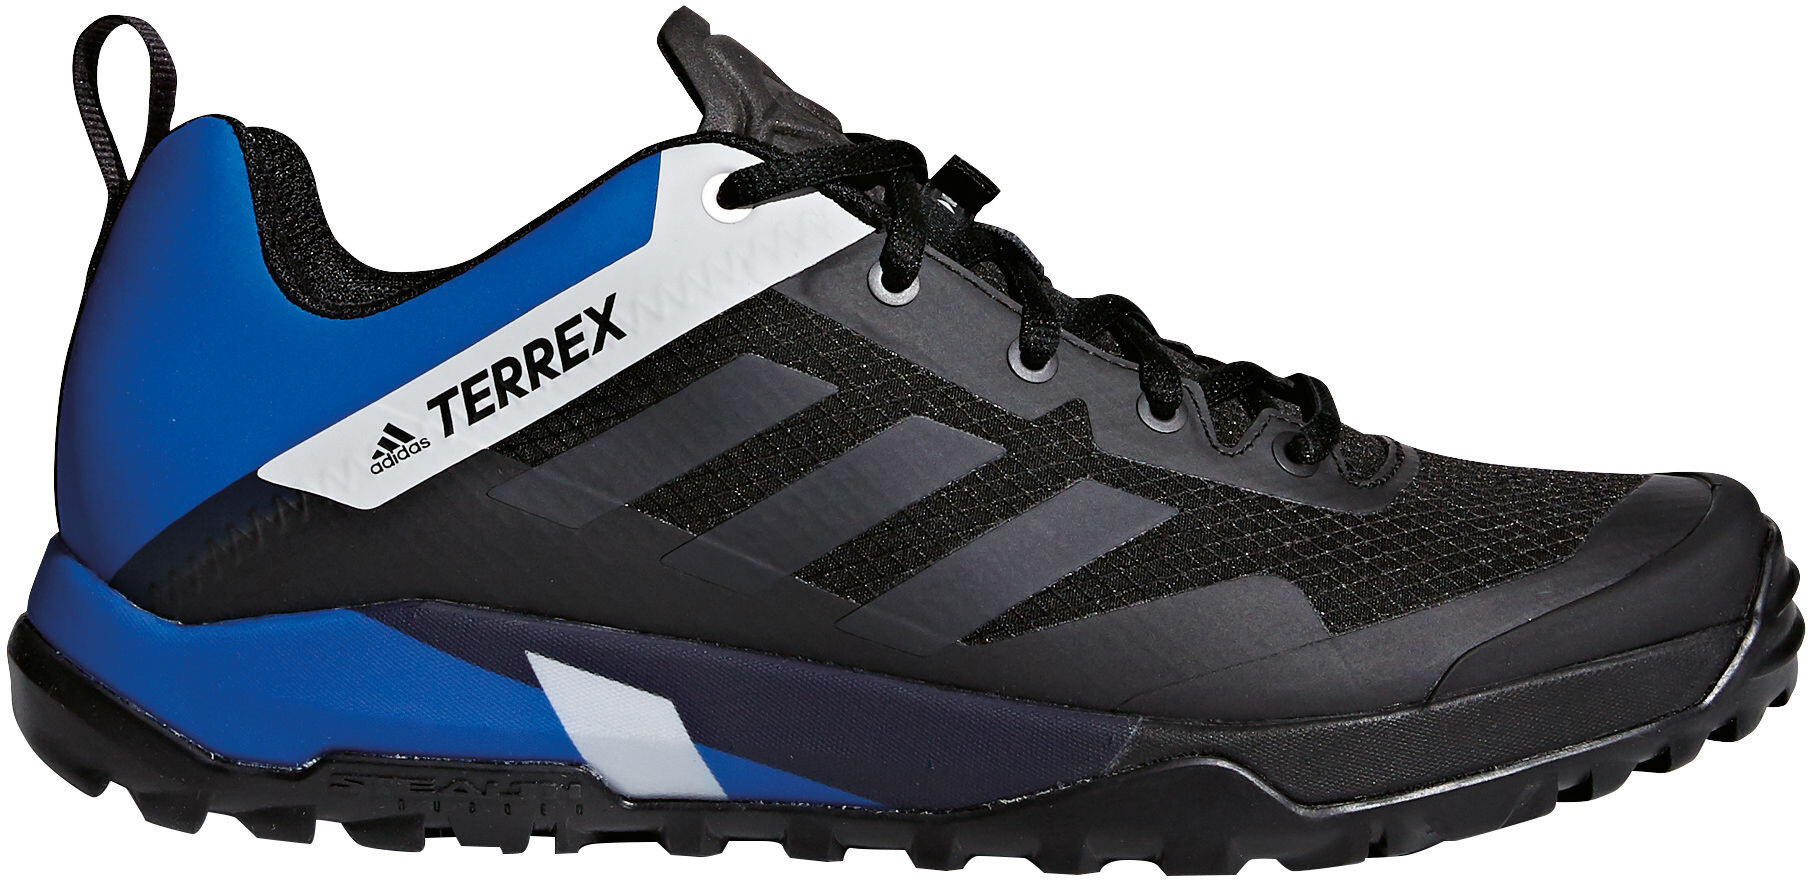 72f42c902b16 adidas TERREX Trail Cross Sl Scarpe Uomo, core black/carbon/blue beauty